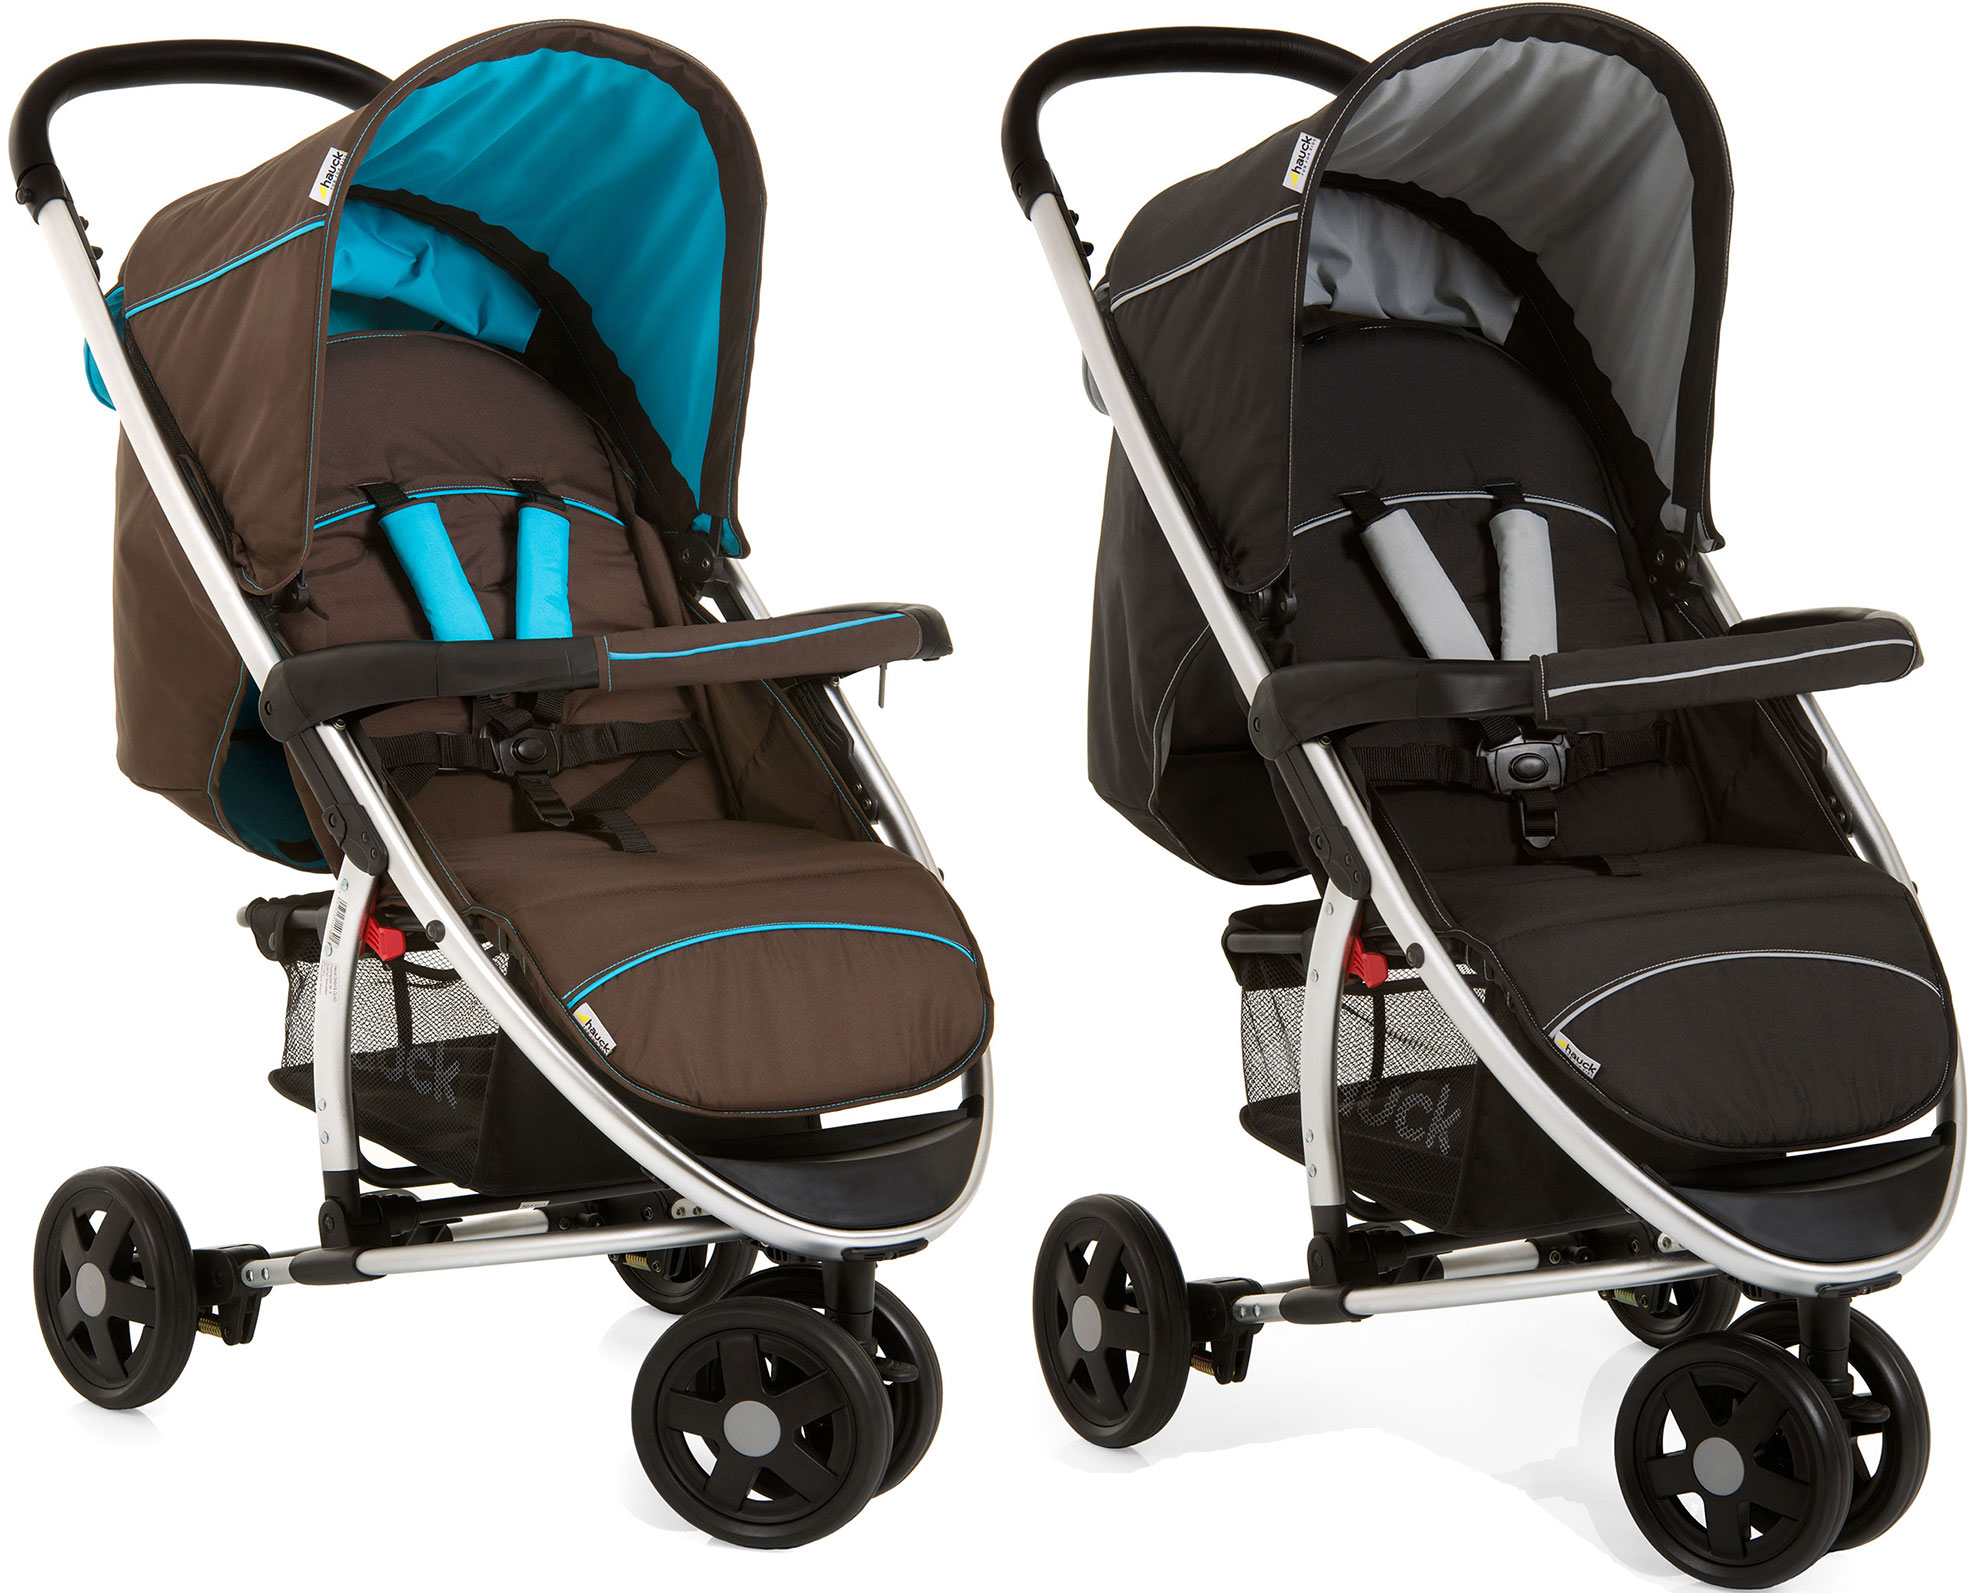 hauck miami 3 stroller 3 wheeler buggy jogger baby toddler. Black Bedroom Furniture Sets. Home Design Ideas